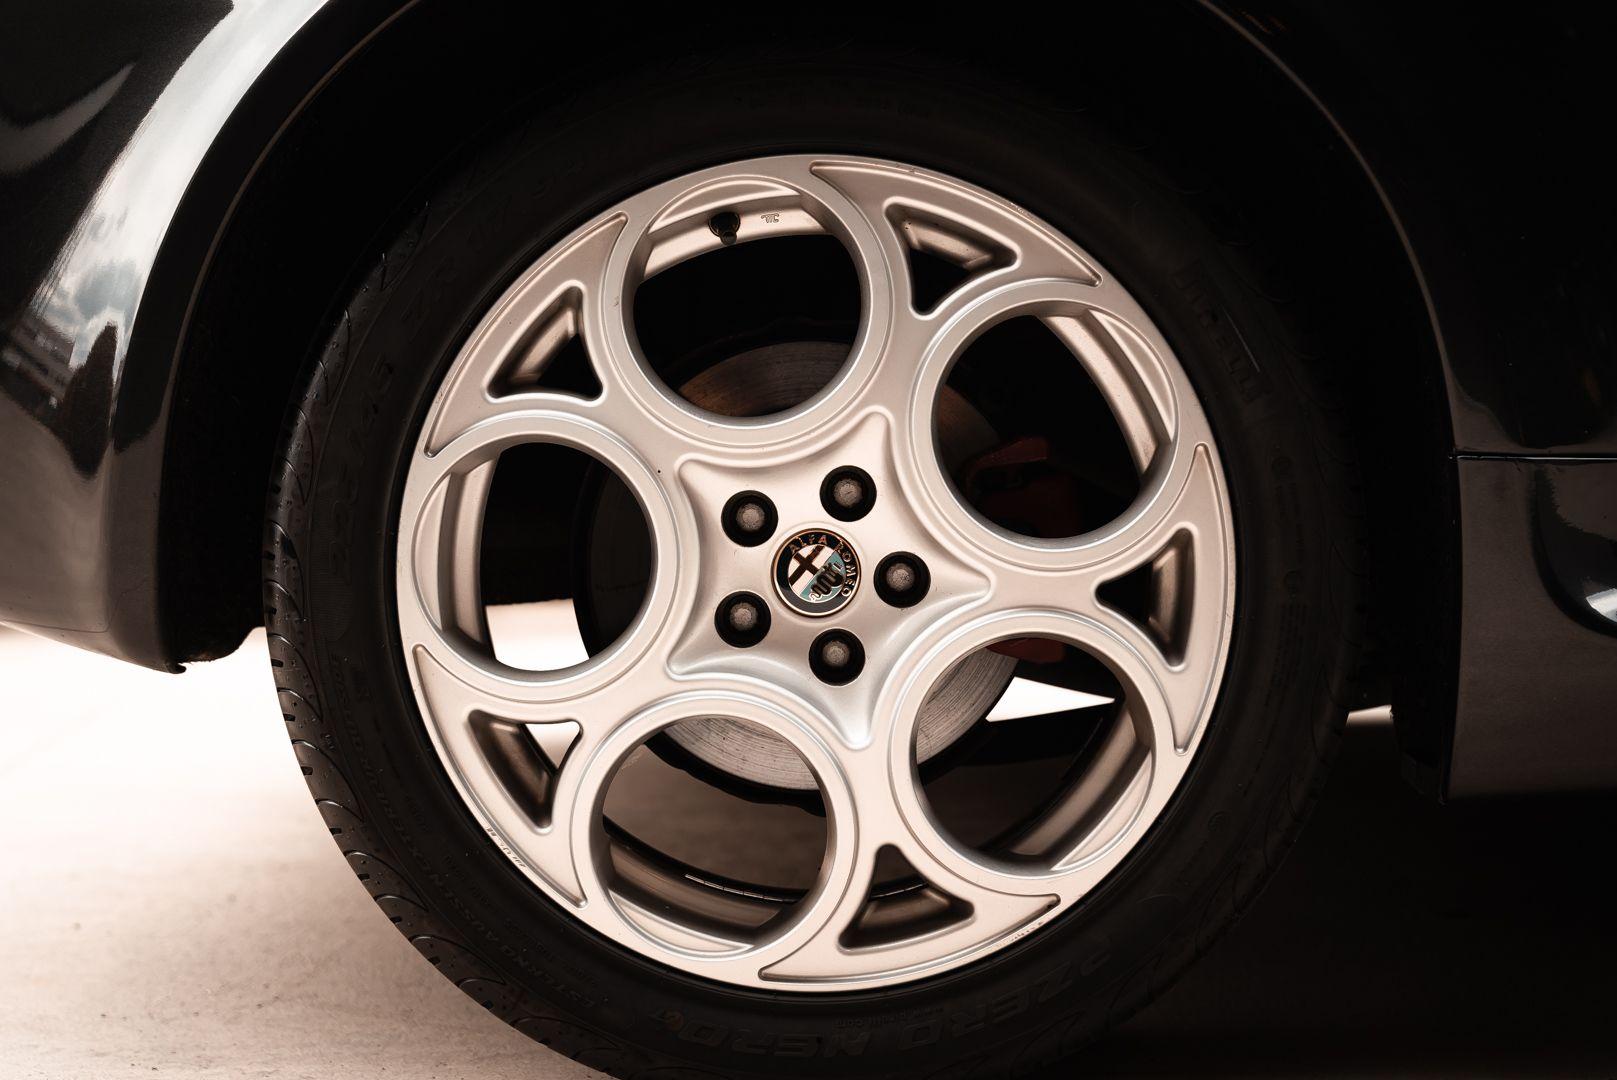 2003 Alfa Romeo 147 GTA 3.2i V6 24V 79578